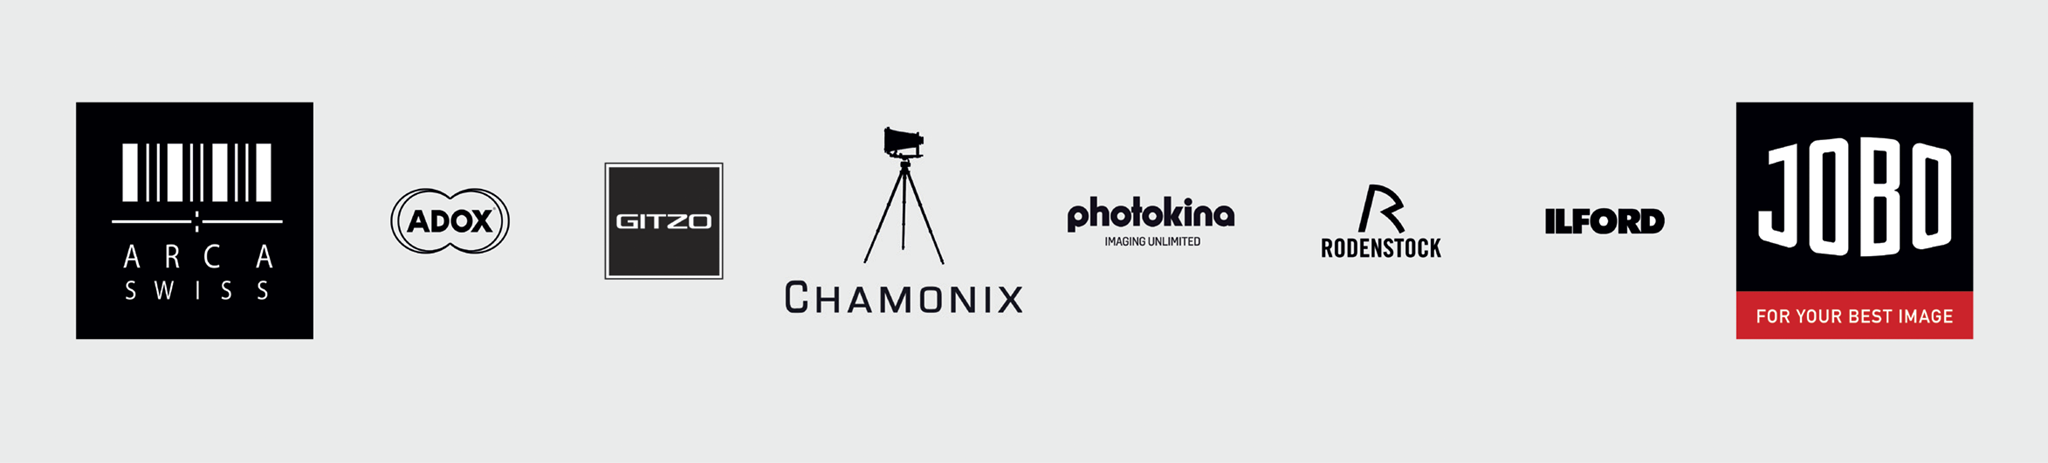 Photo Contest Award Ceremony 2018_Flyer_2018-08-17_flyeralarm_Schnittmarken-sponsors.png